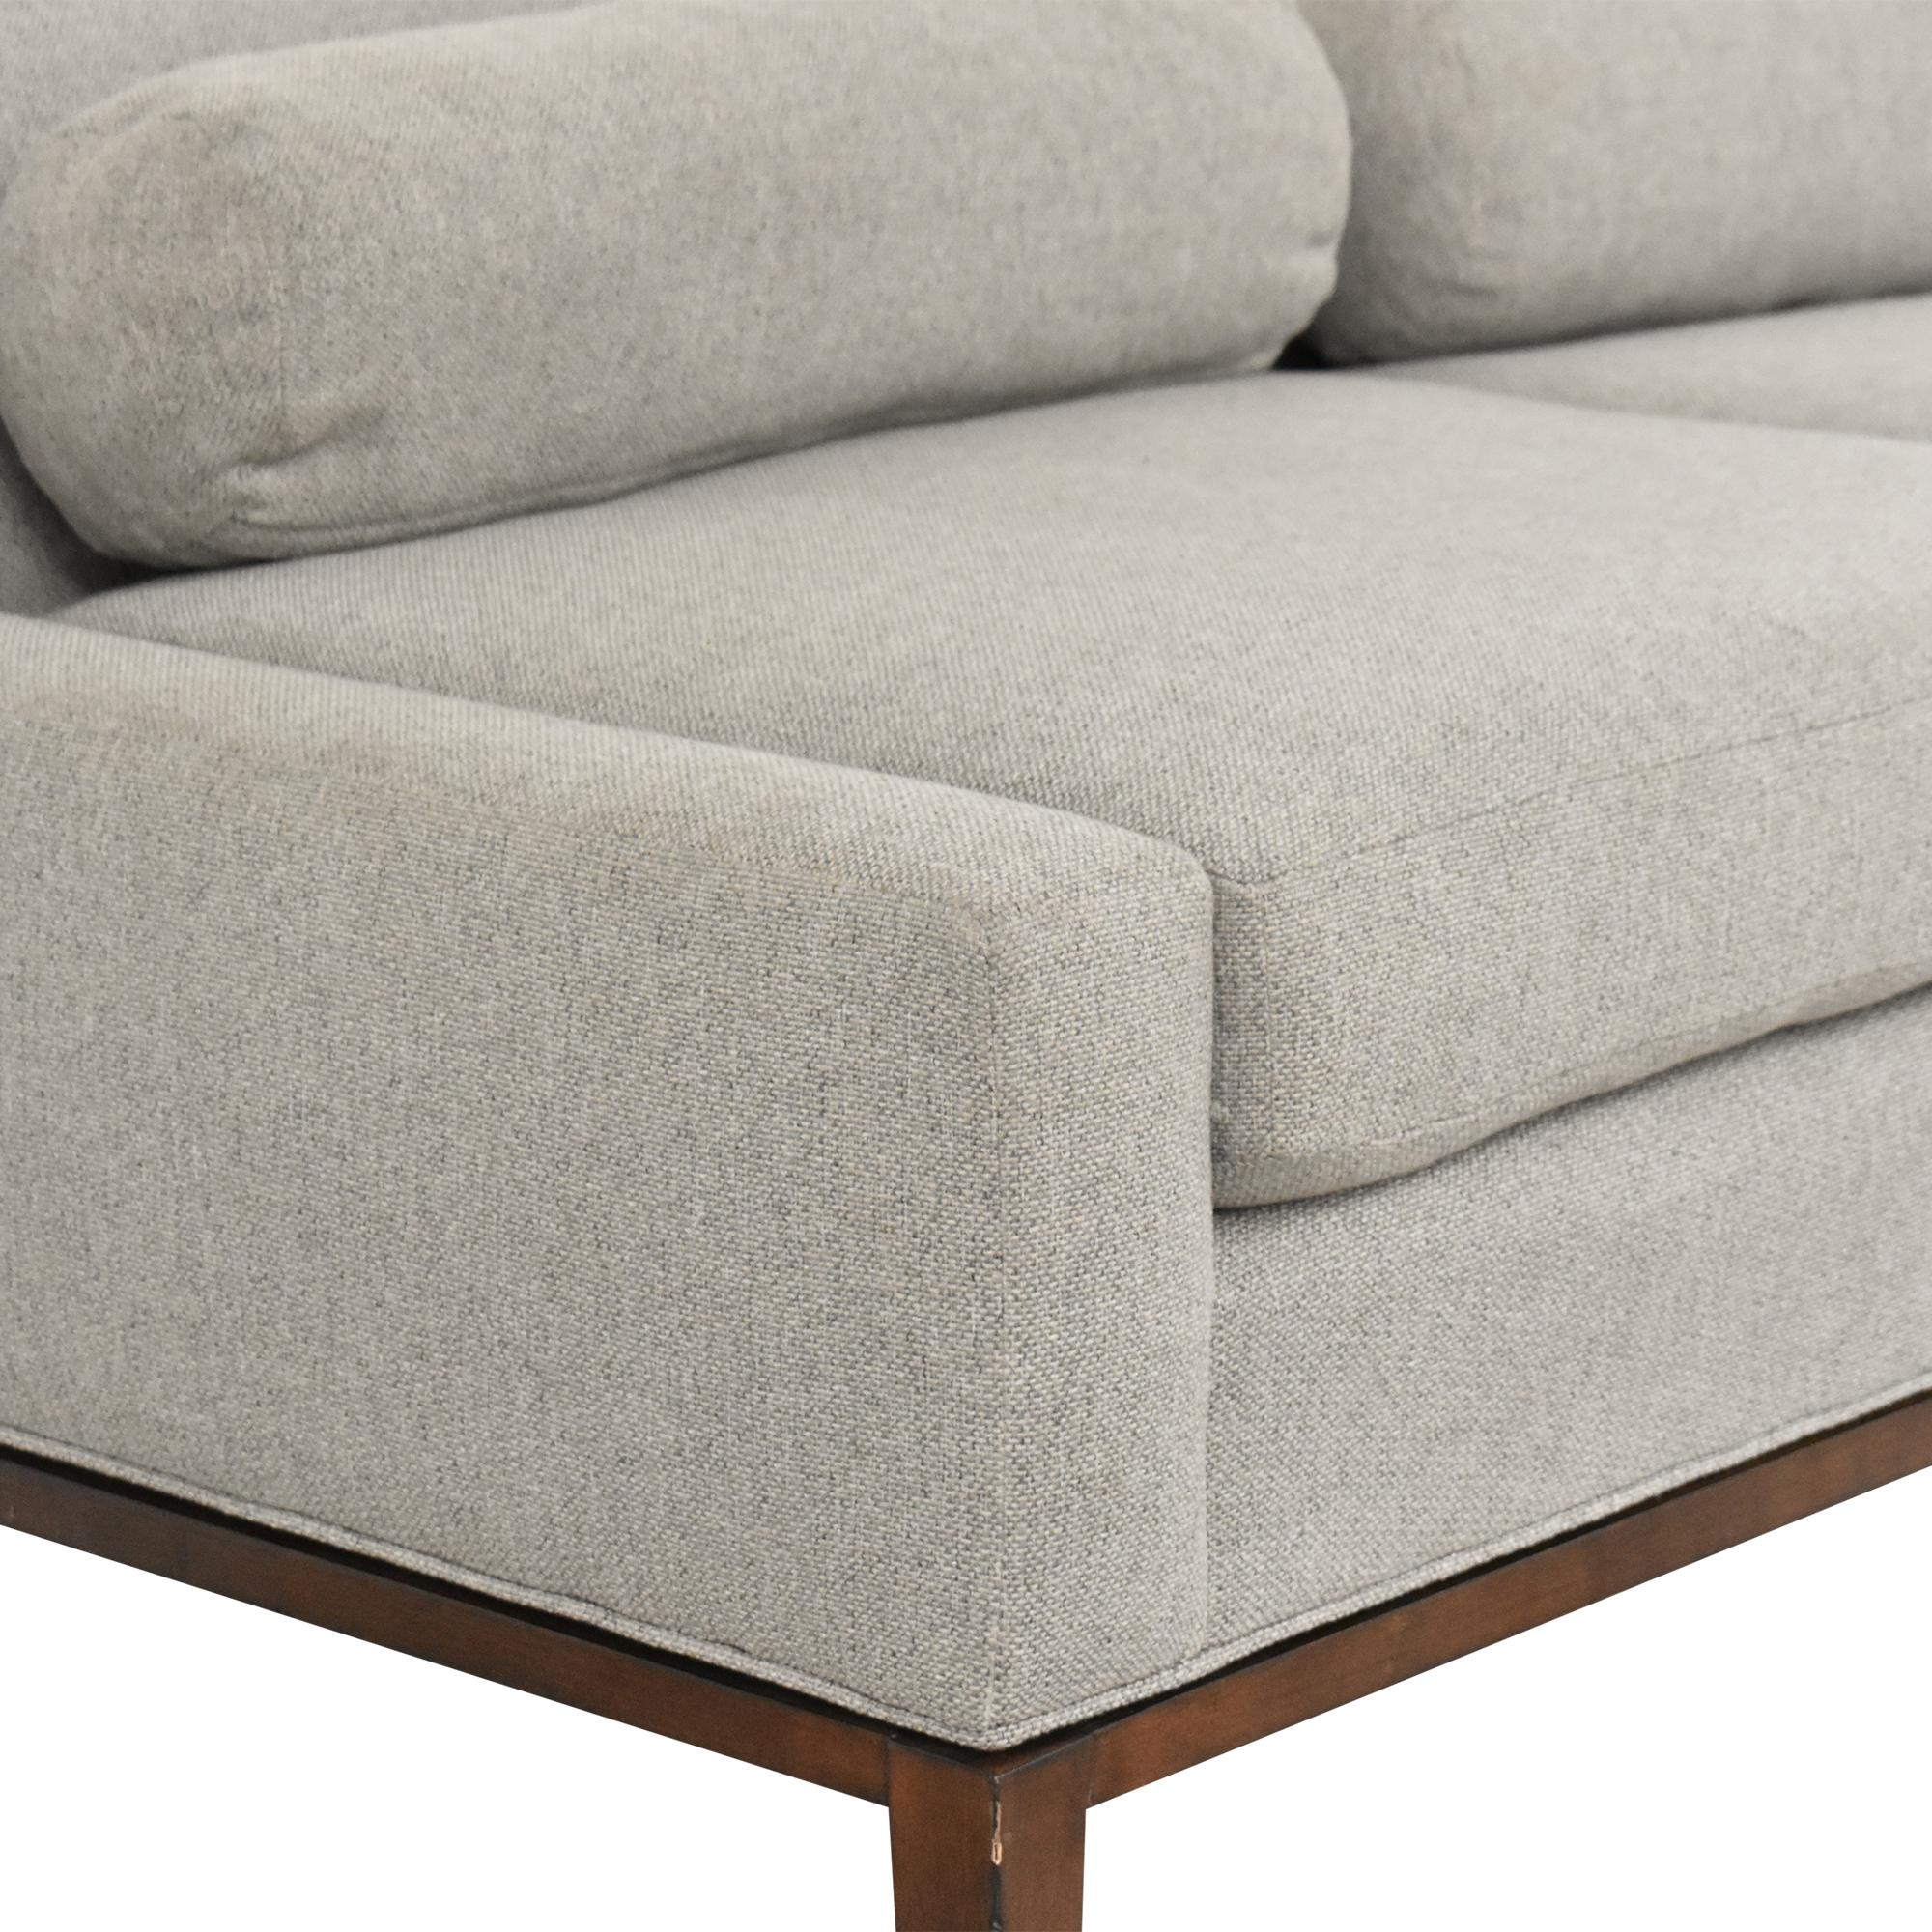 buy Vanguard Furniture Jacen Footboard Sofa Vanguard Furniture Classic Sofas